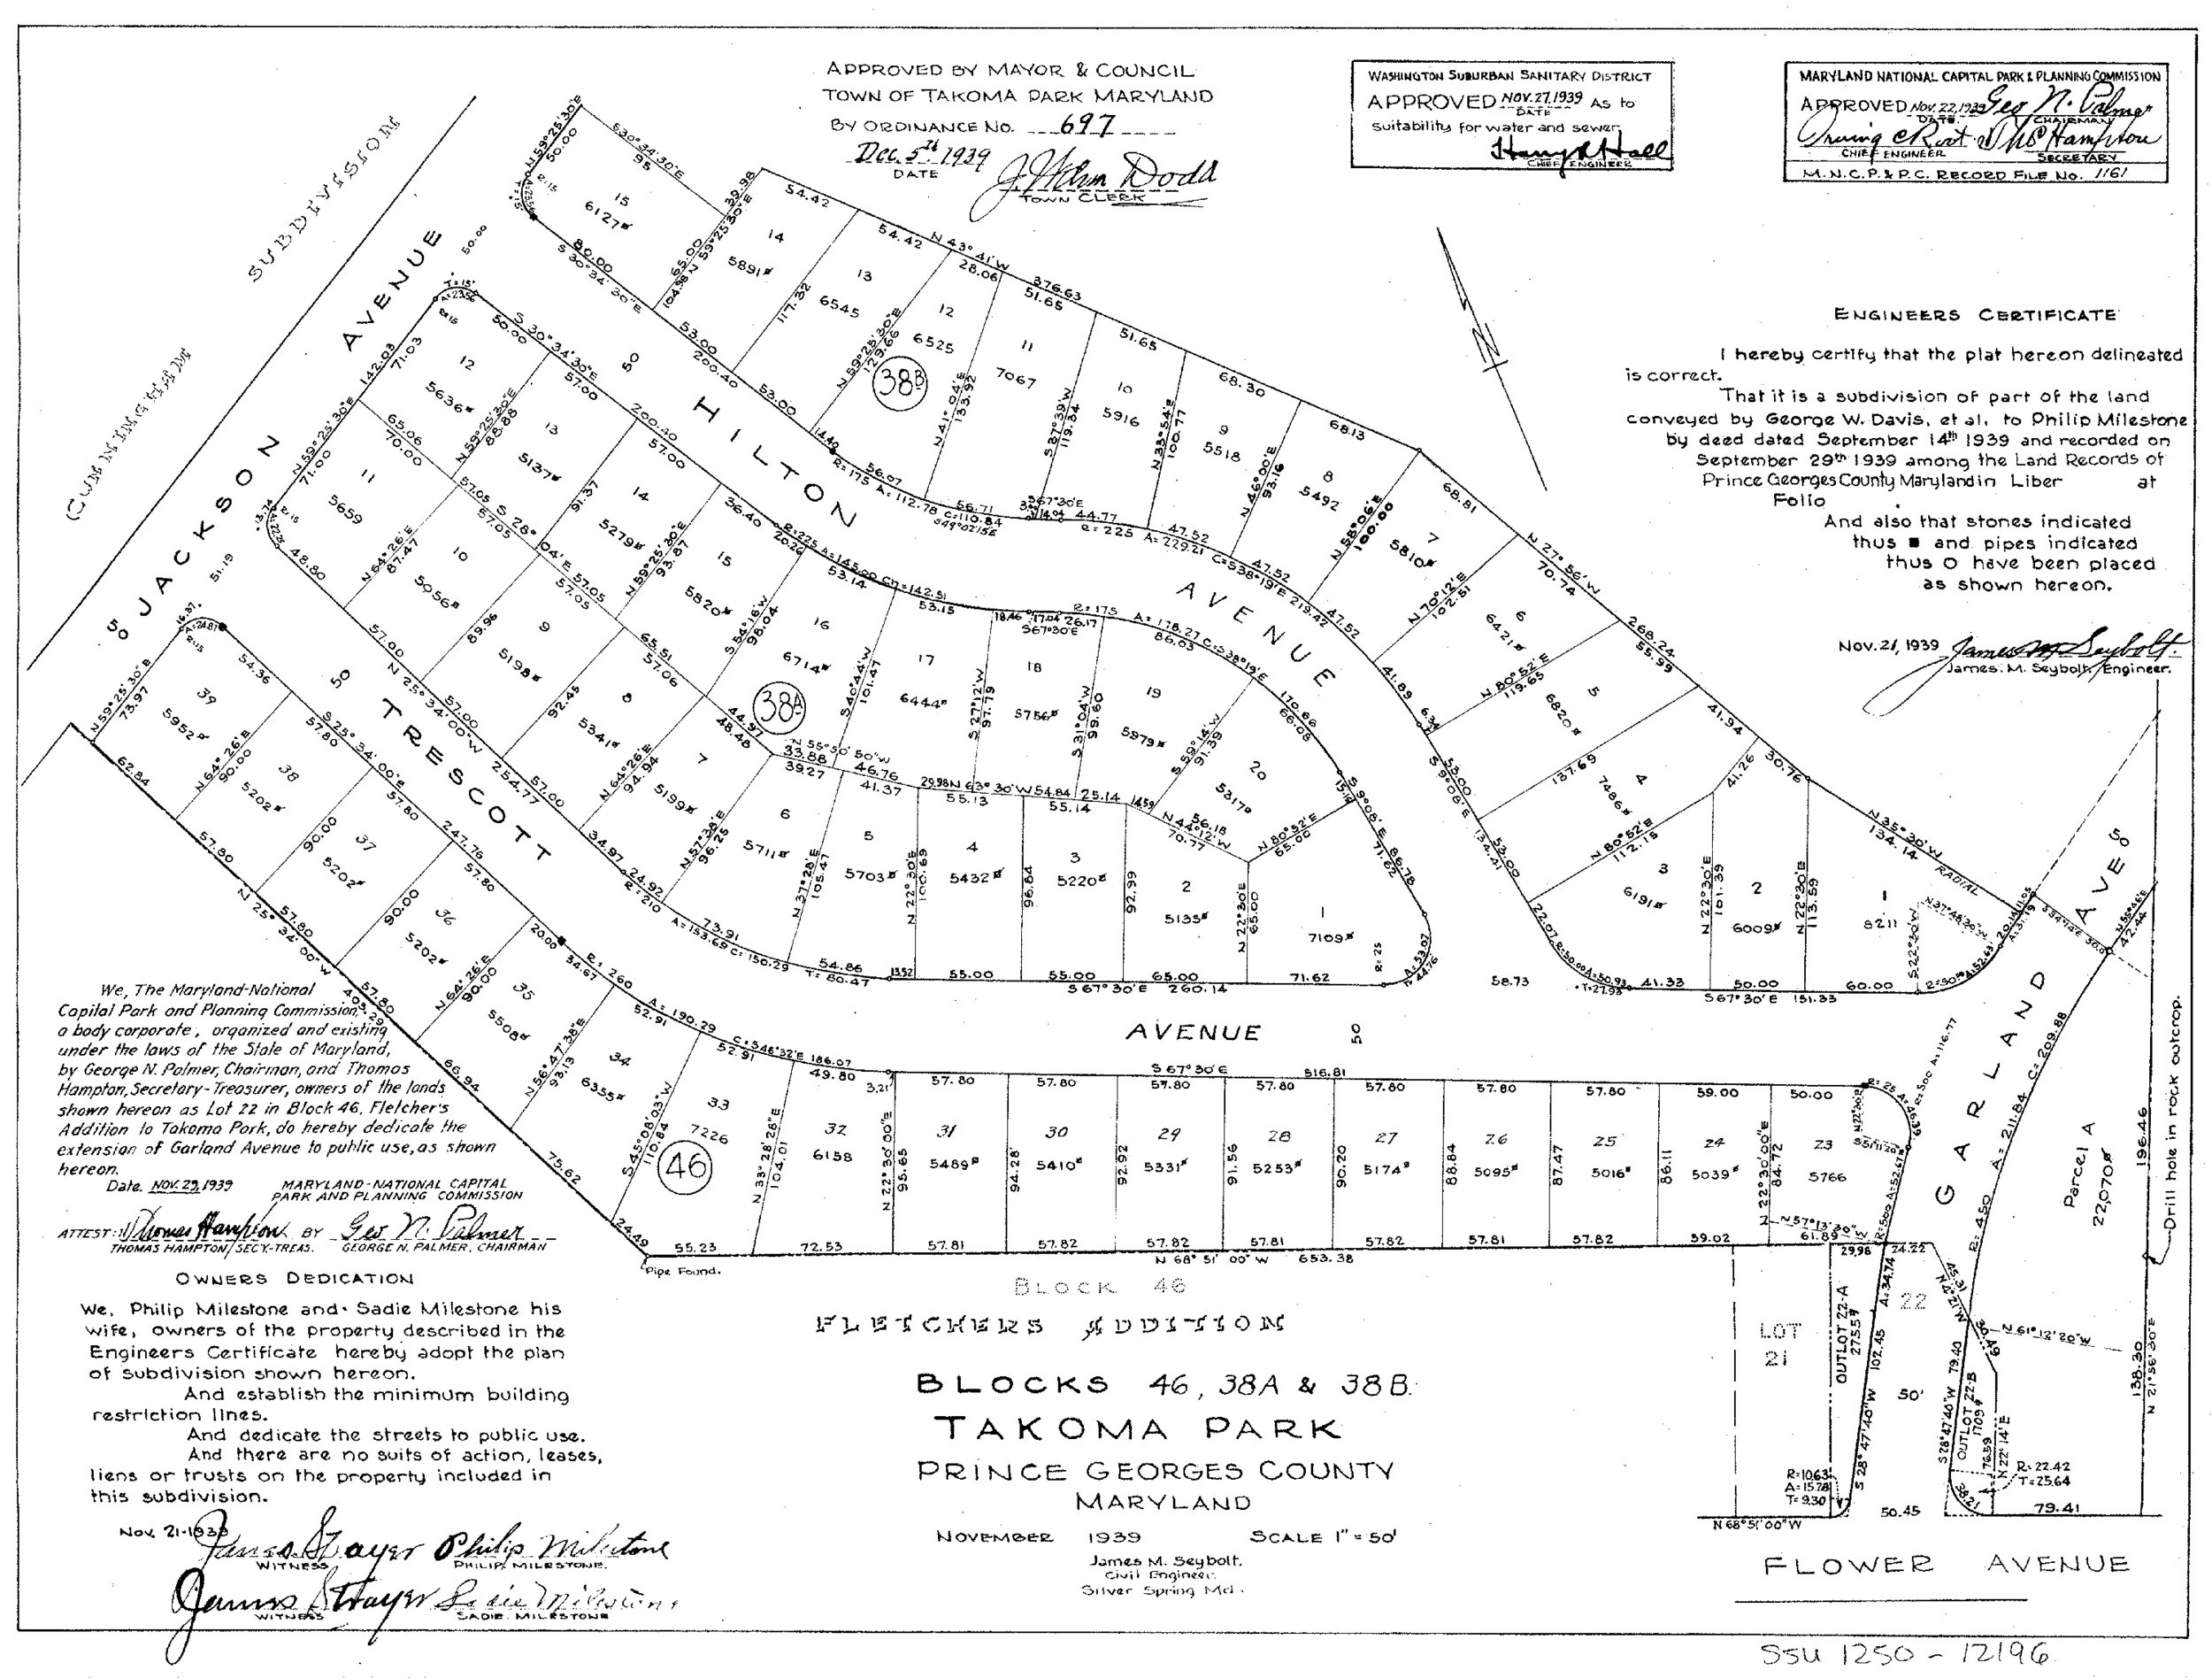 Plat of a neighborhood in Takoma Park.